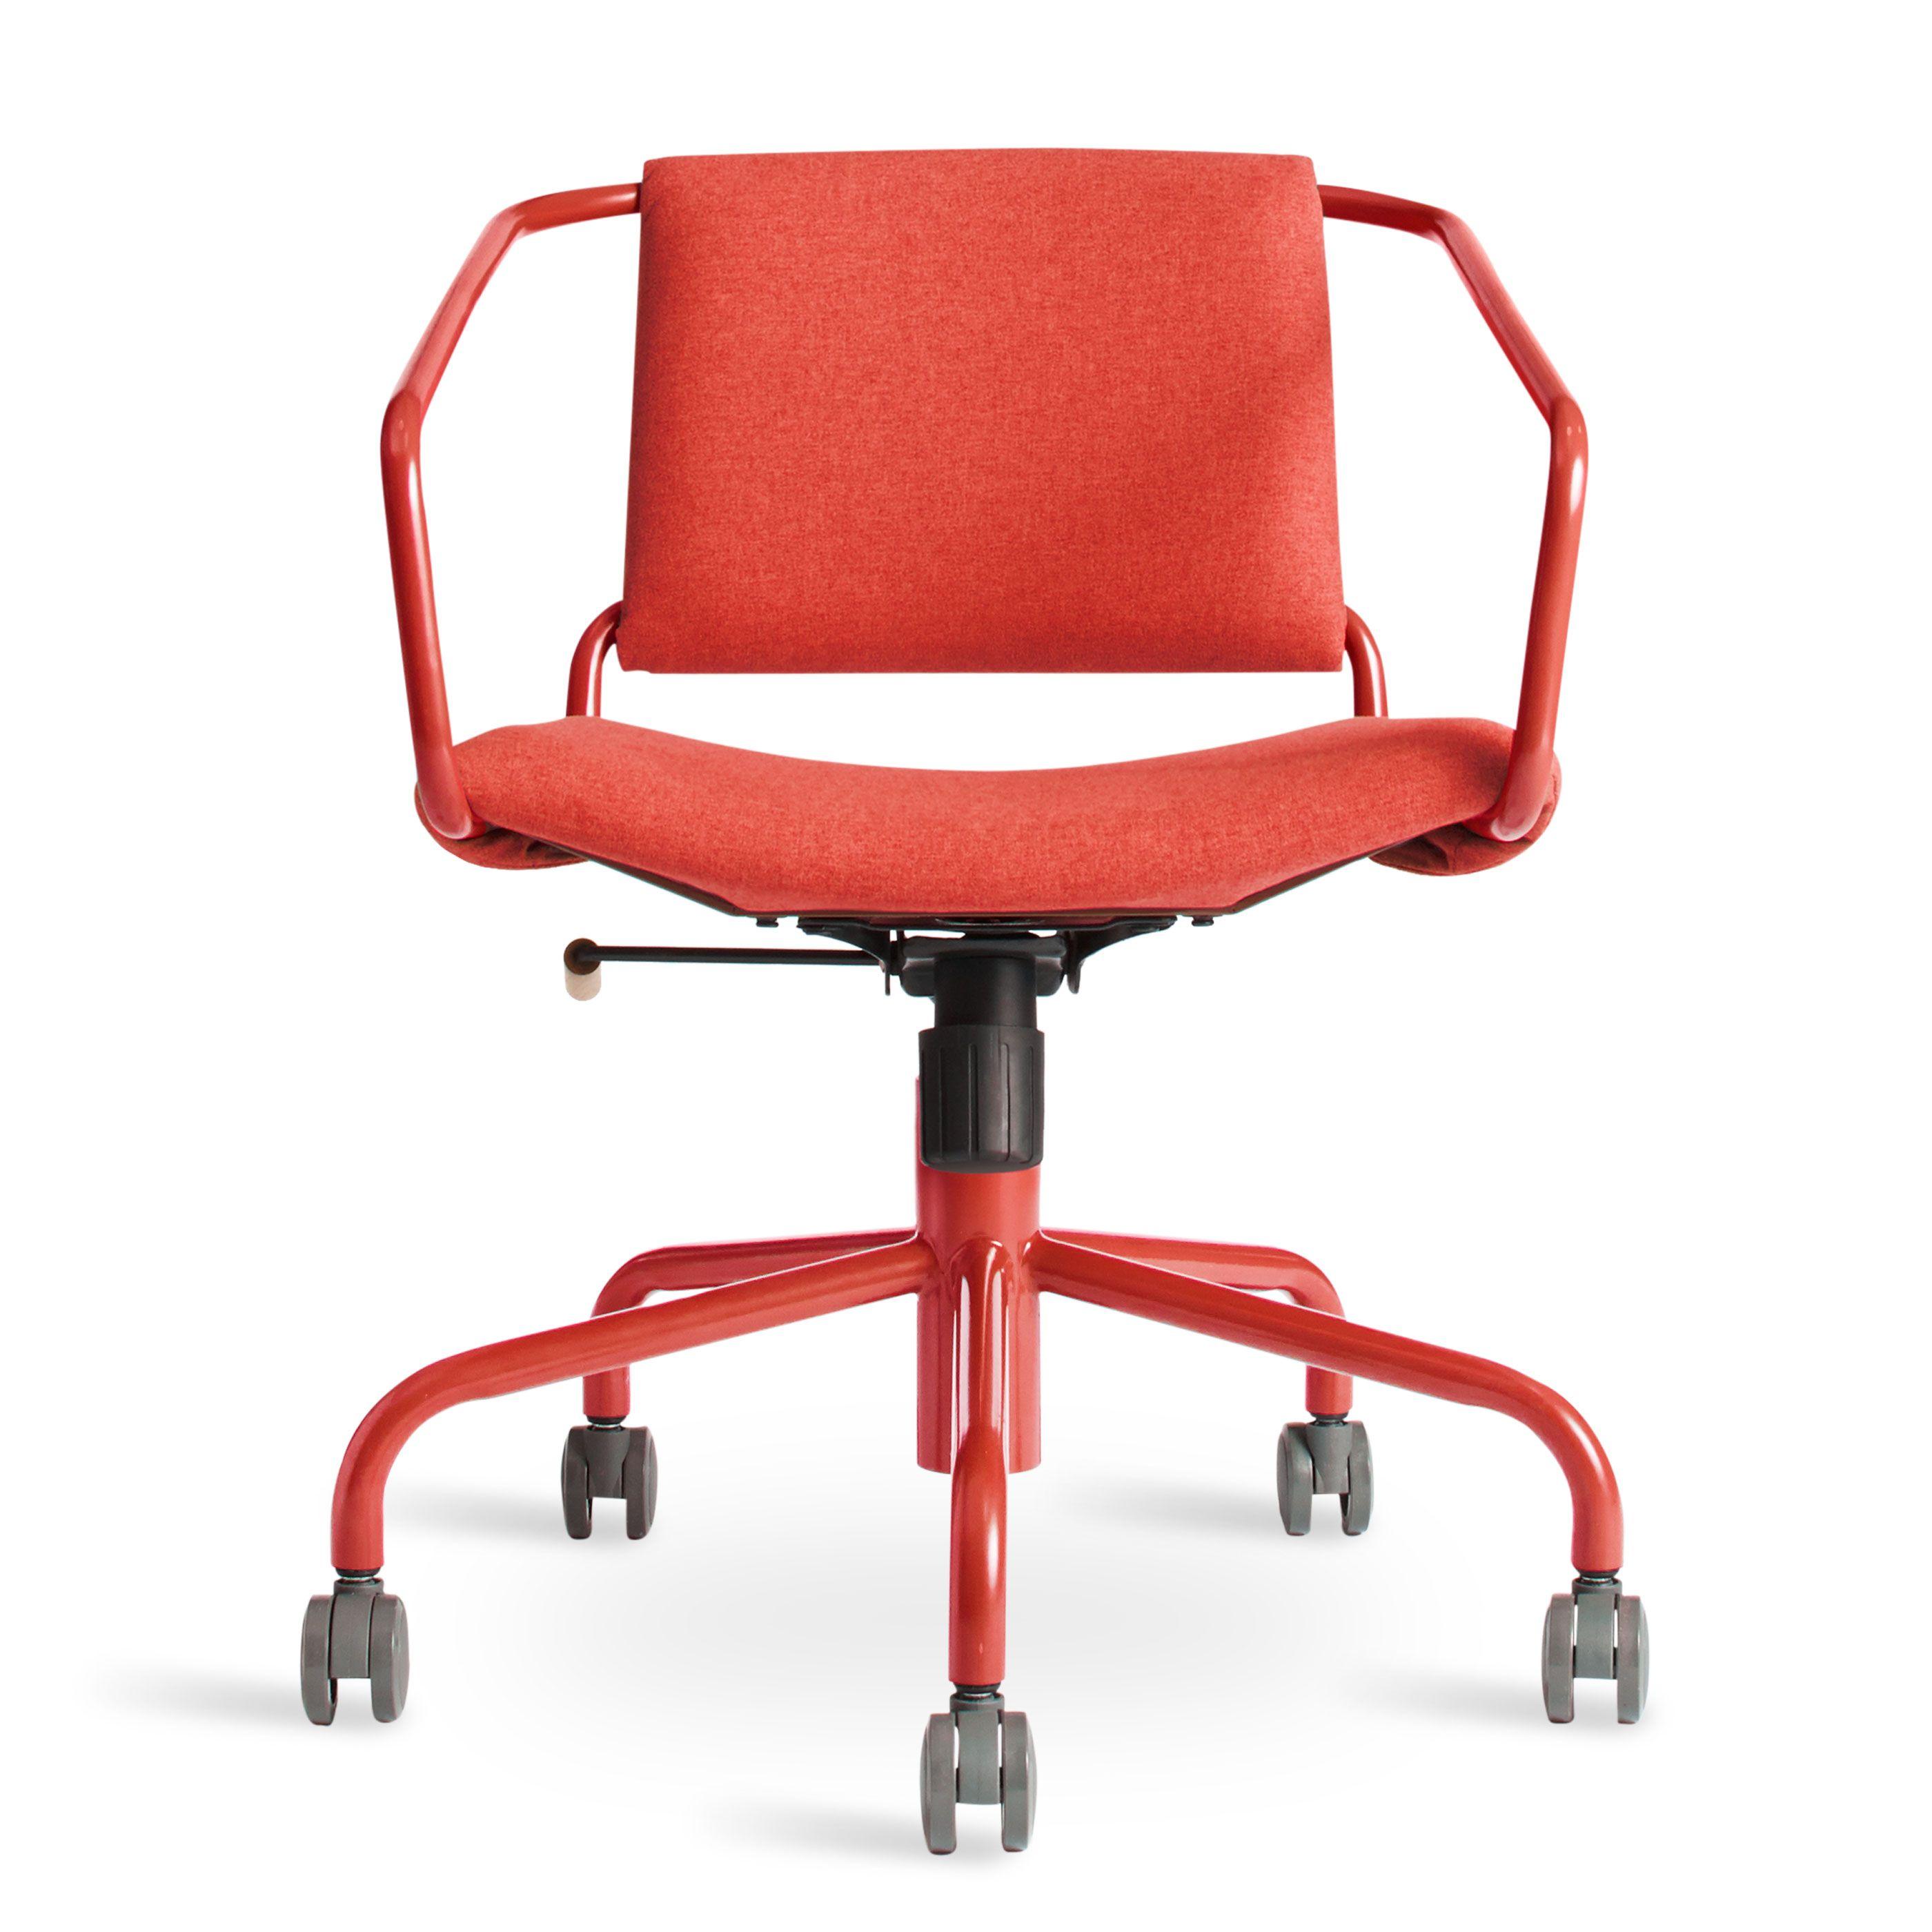 Daily Task Chair Modern Task Chairs Blu Dot Task Chair Modern Office Chair Office Chair